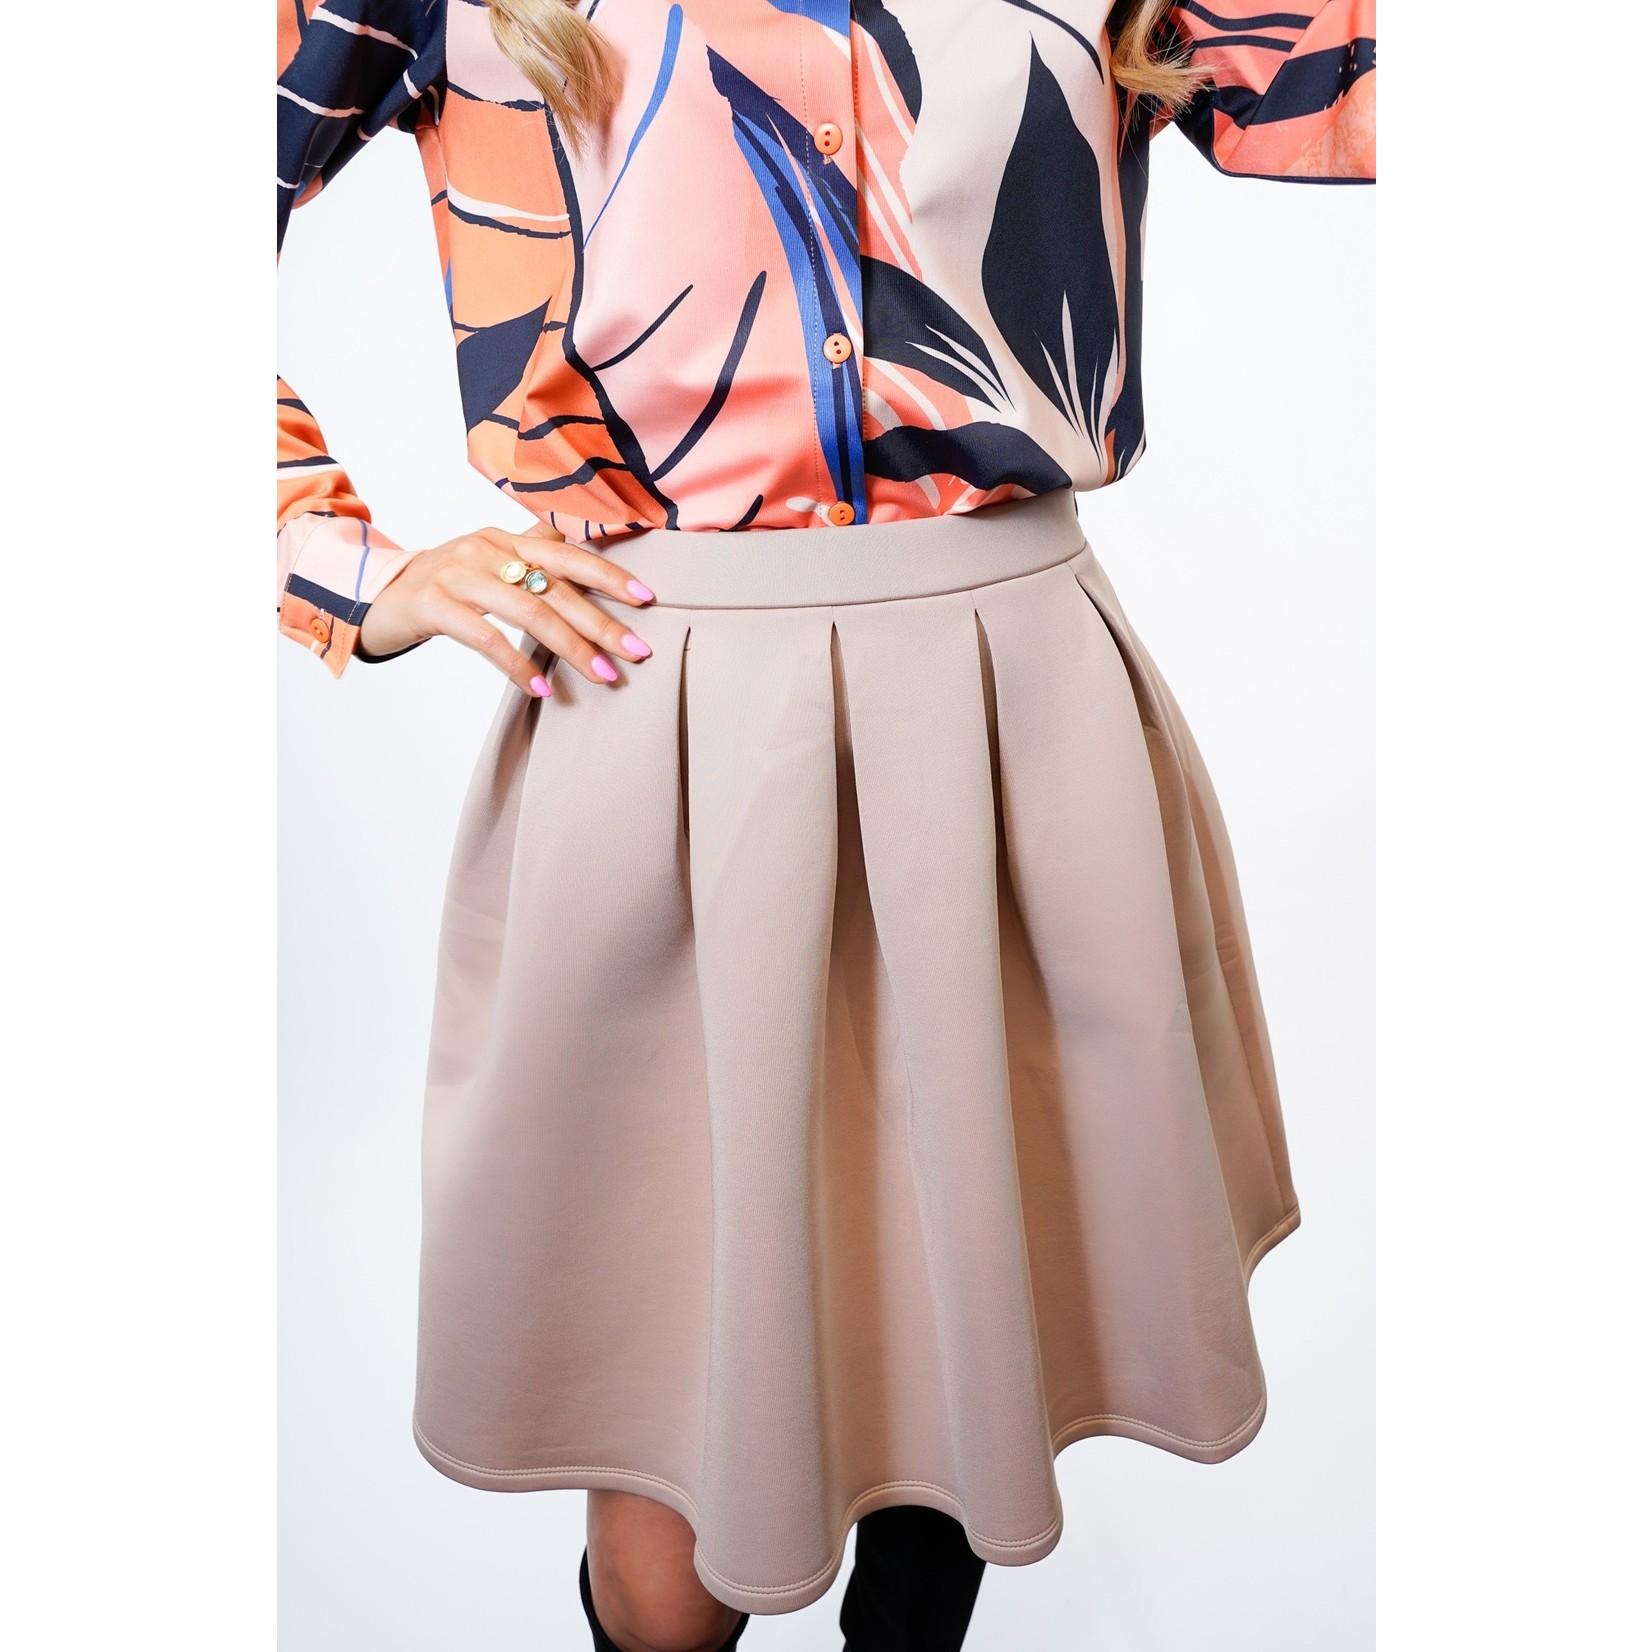 Yentl K Scuba Skirt 28-3